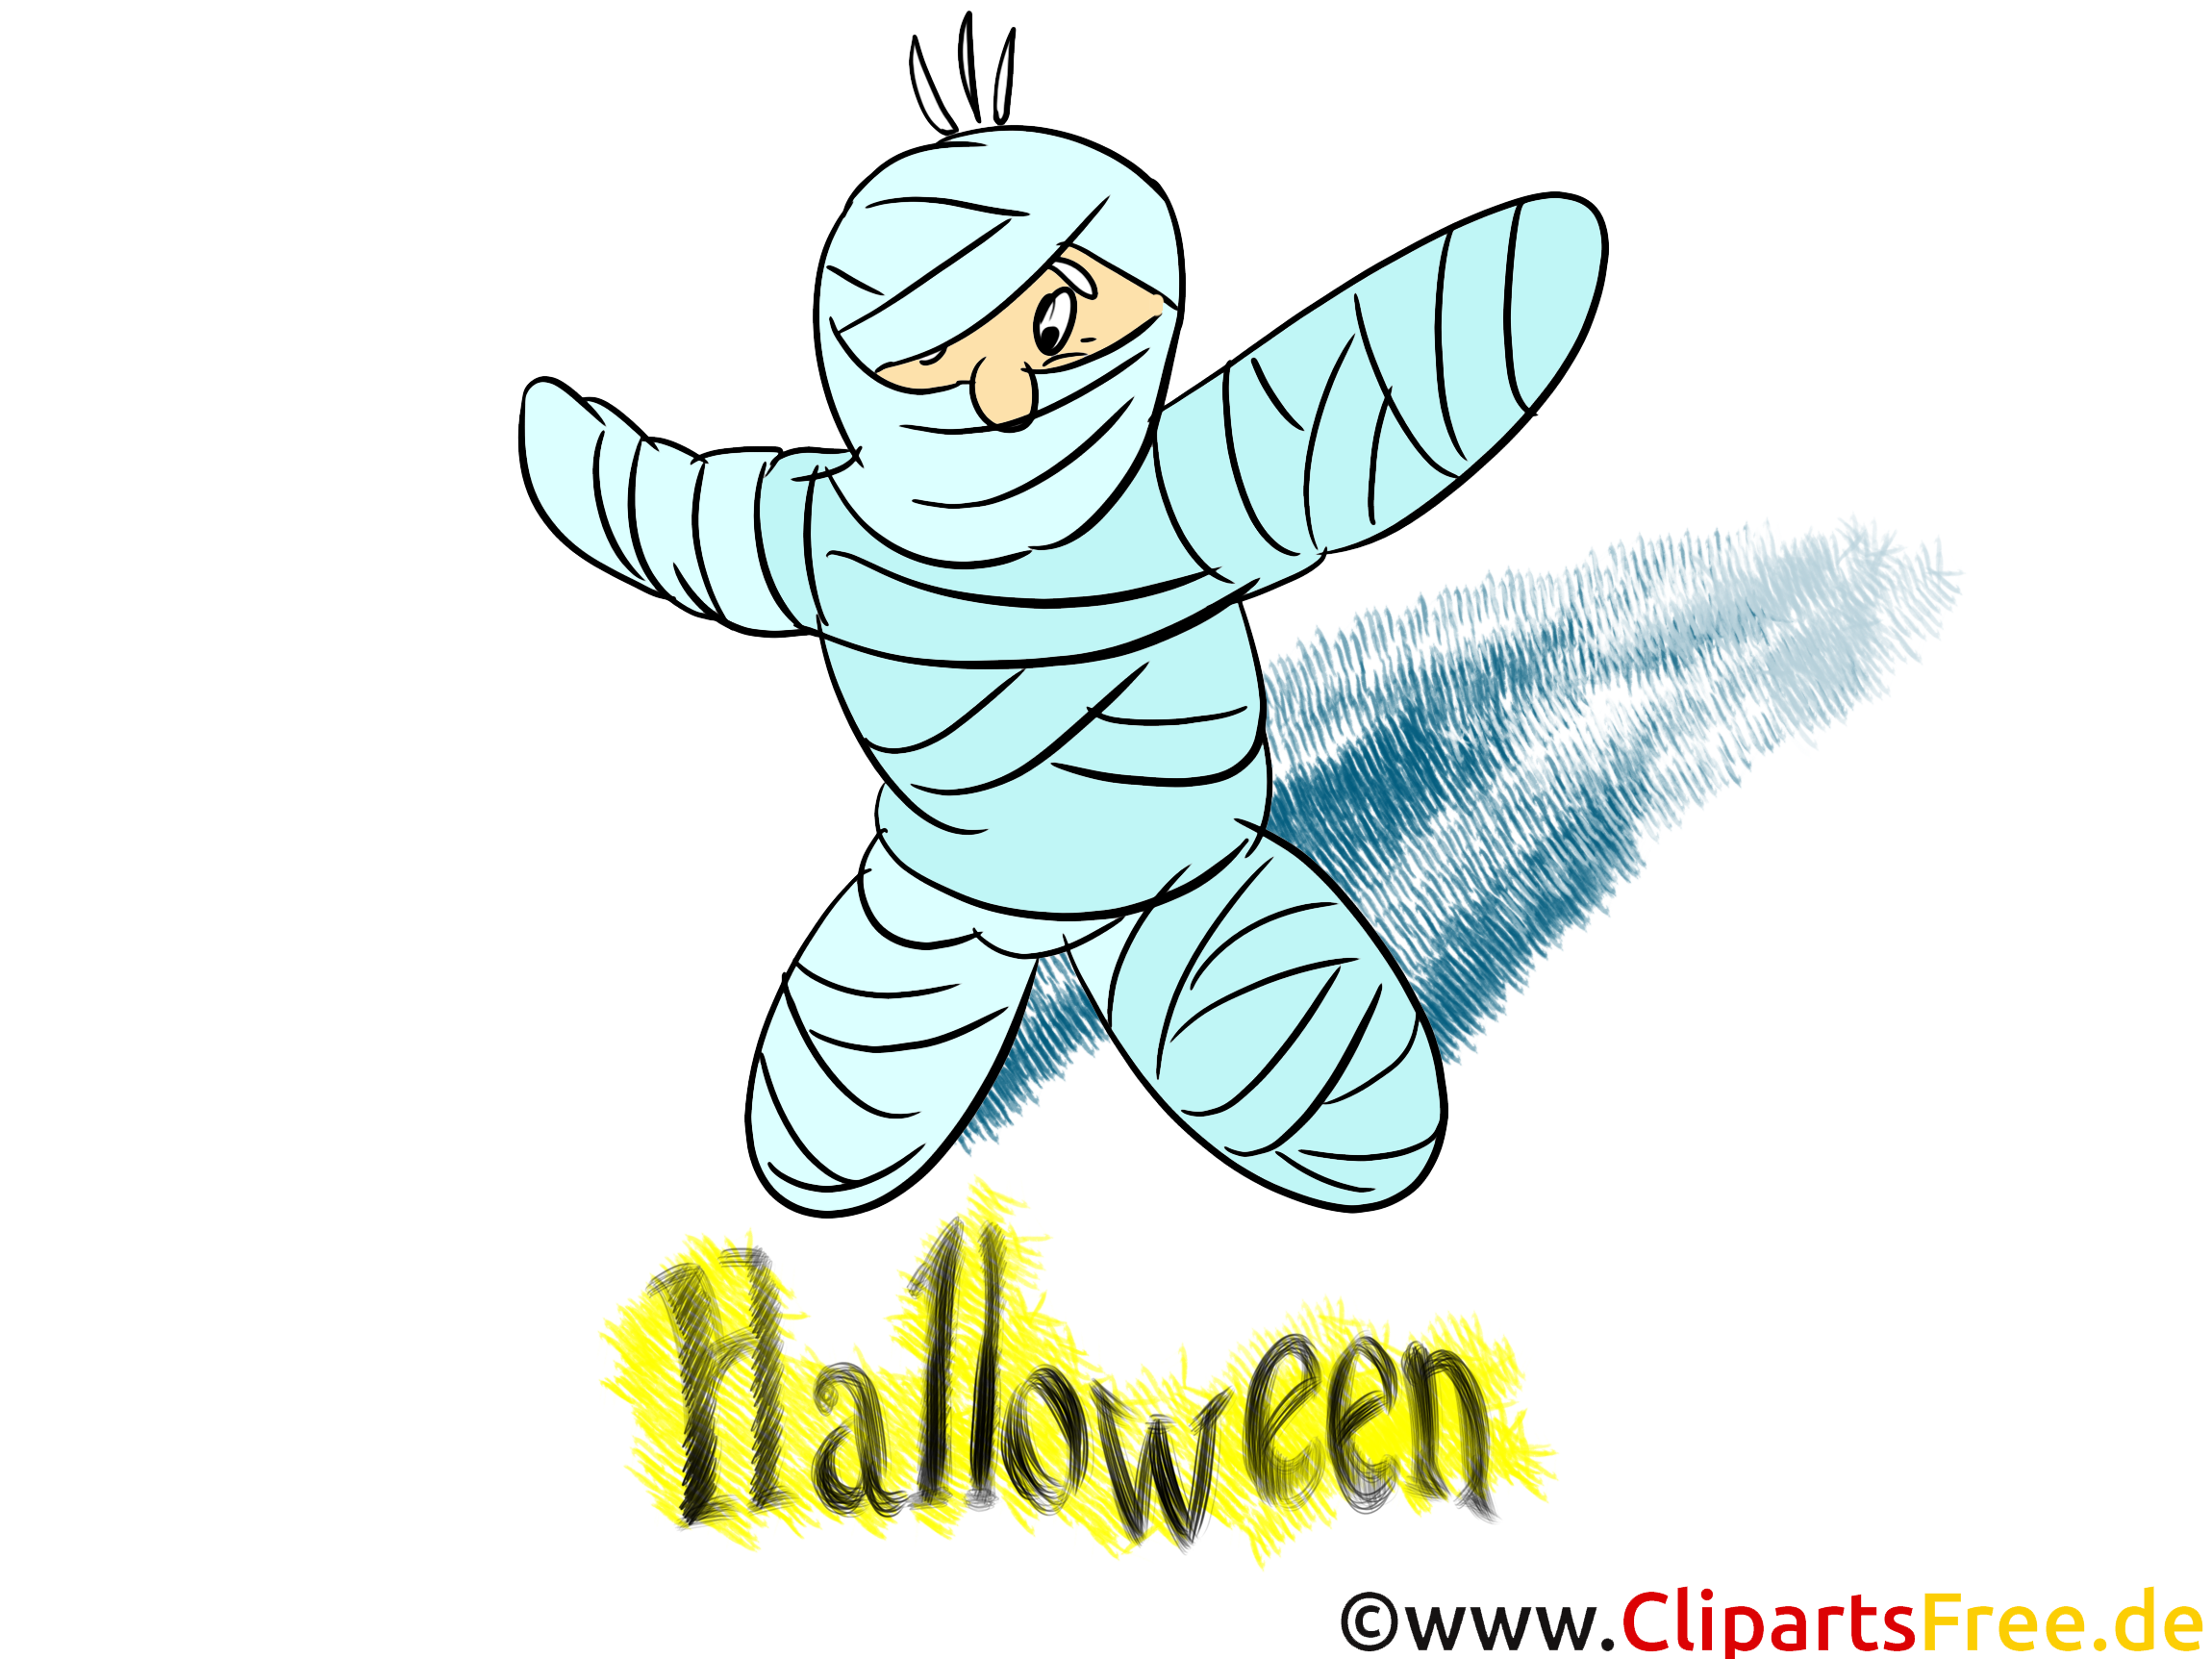 Momie clipart - Halloween dessins gratuits